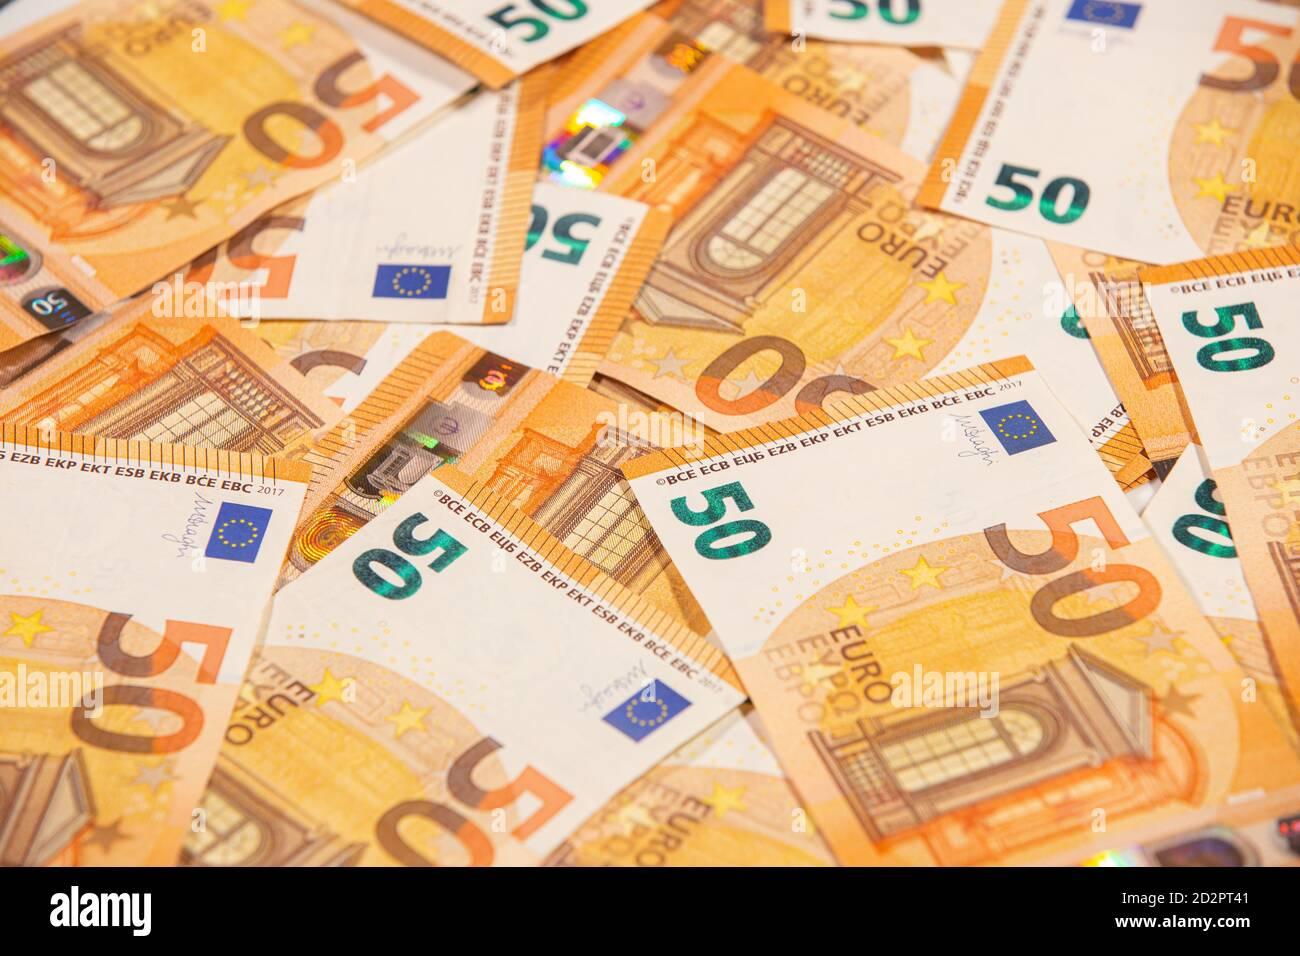 Texto de fondo de cincuenta billetes en euros. Enfoque selectivo. Foto de stock